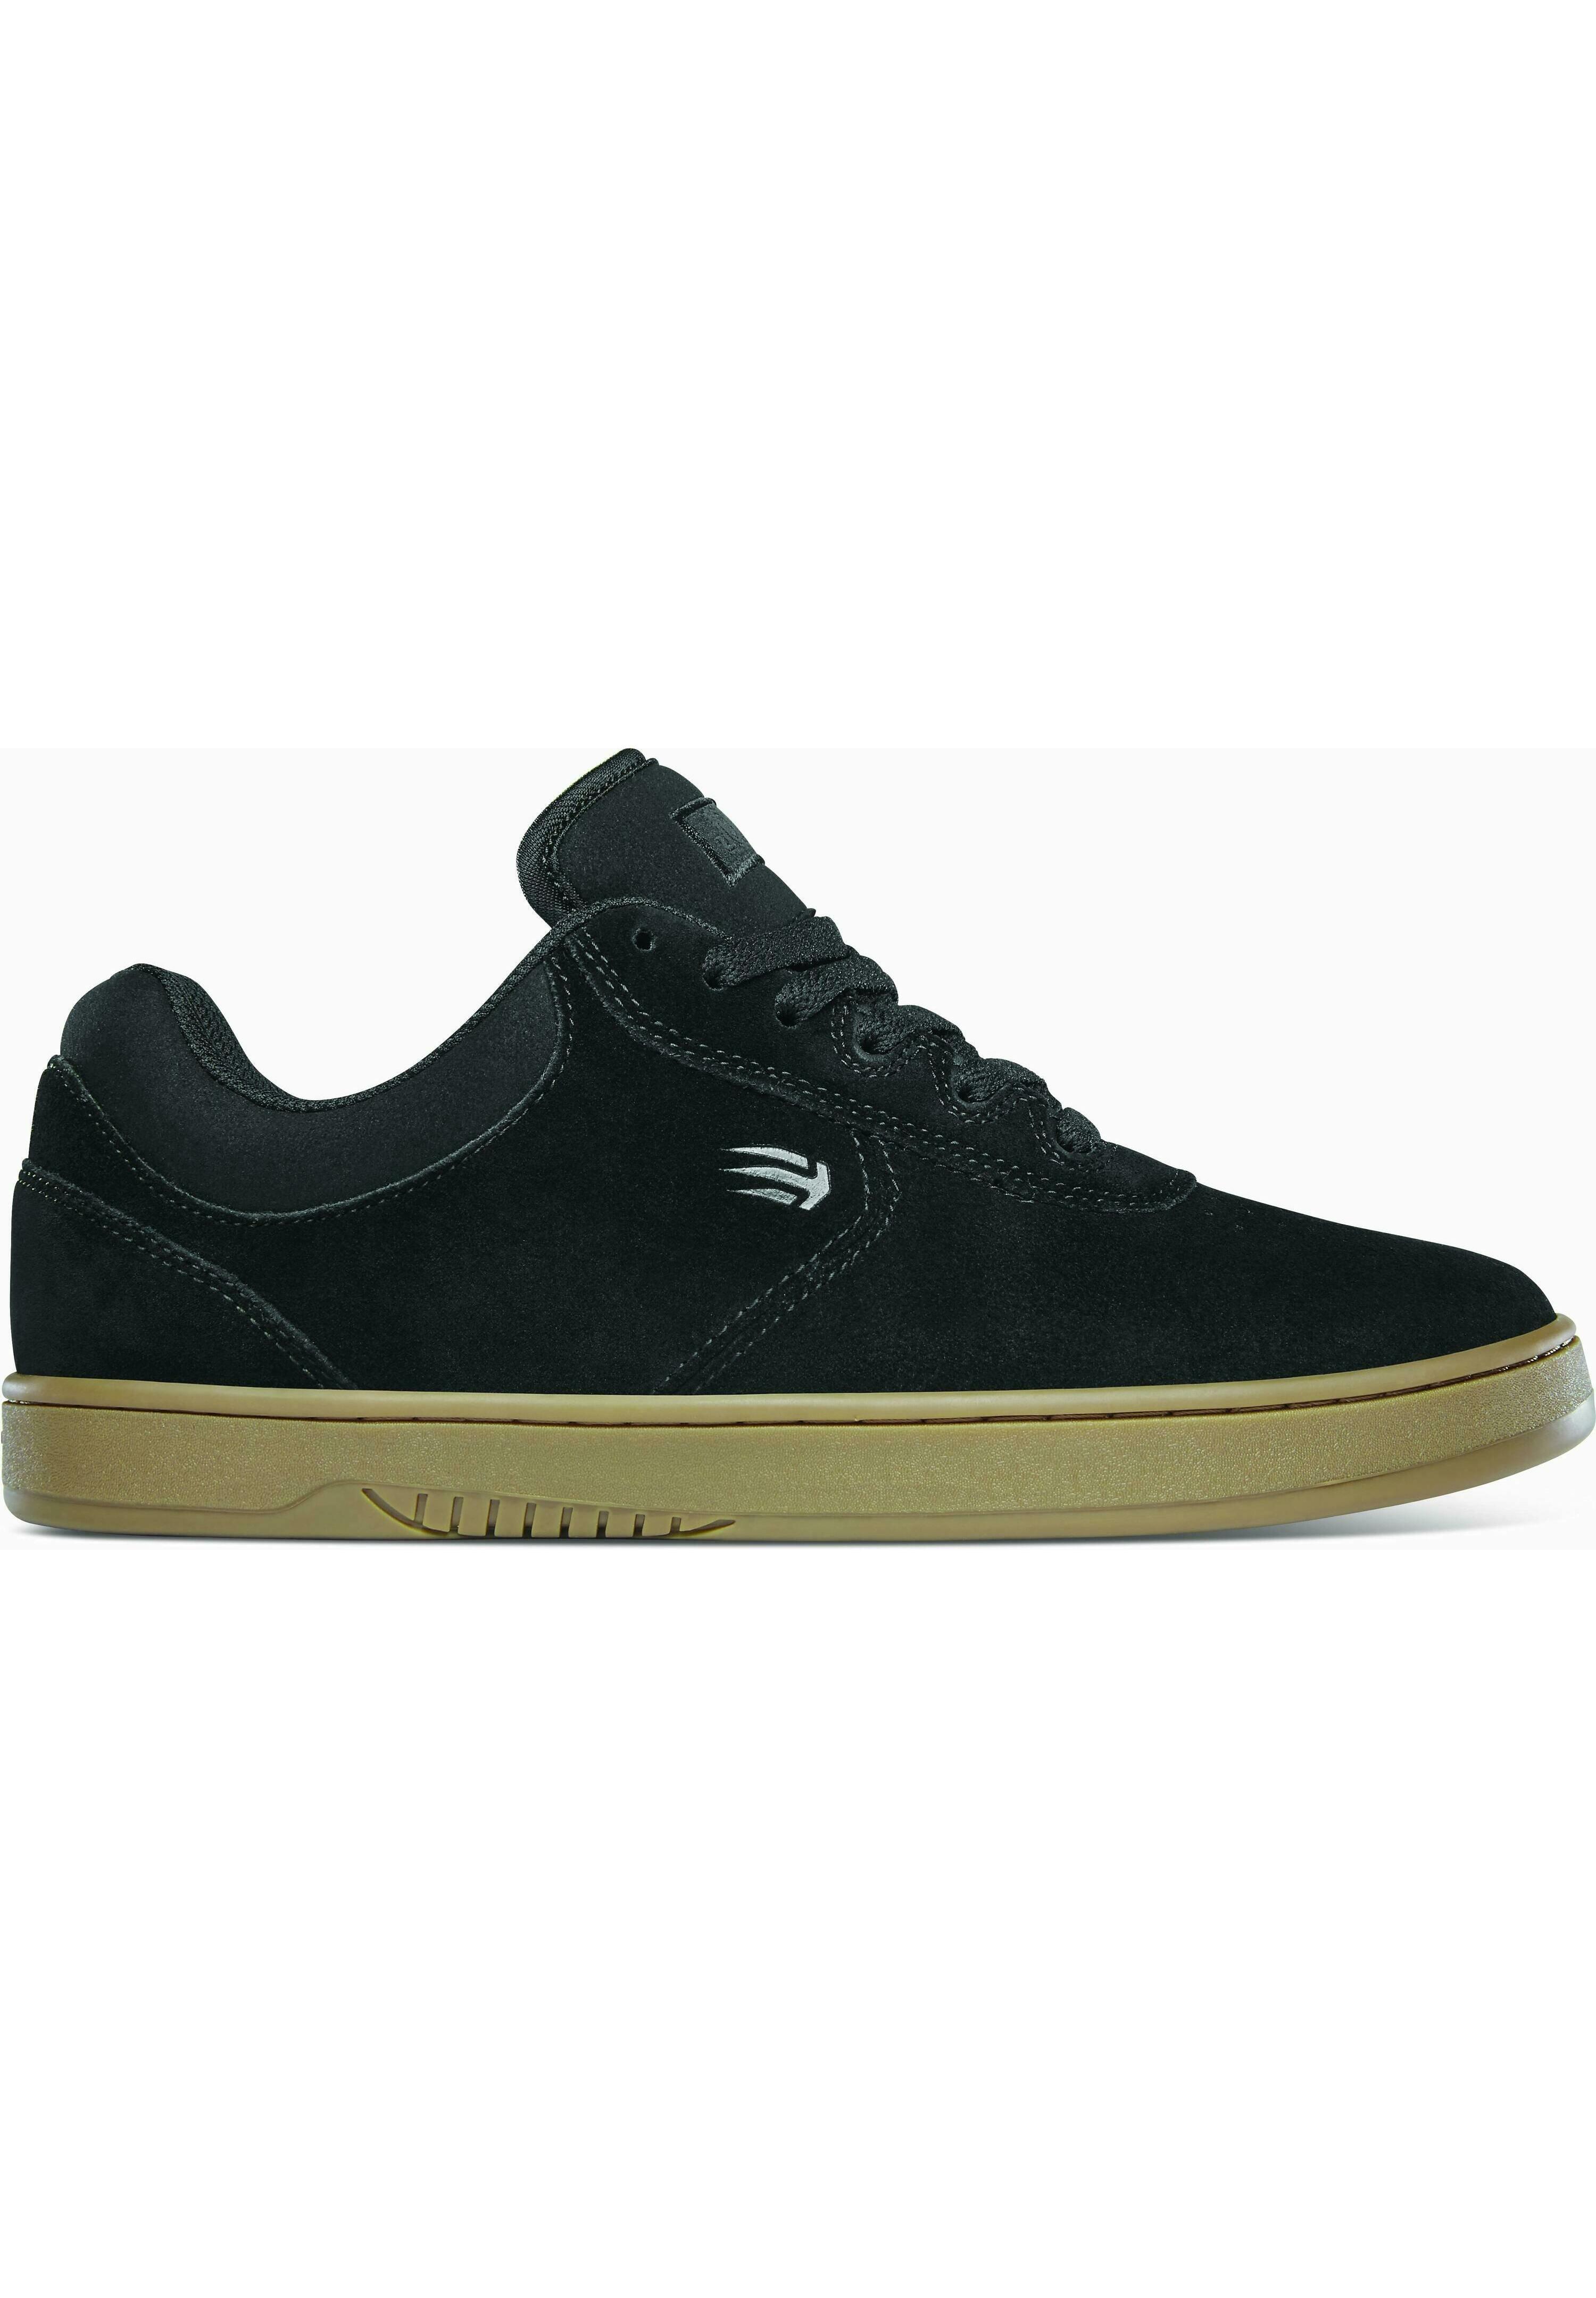 Homme JOSLIN - Chaussures de skate